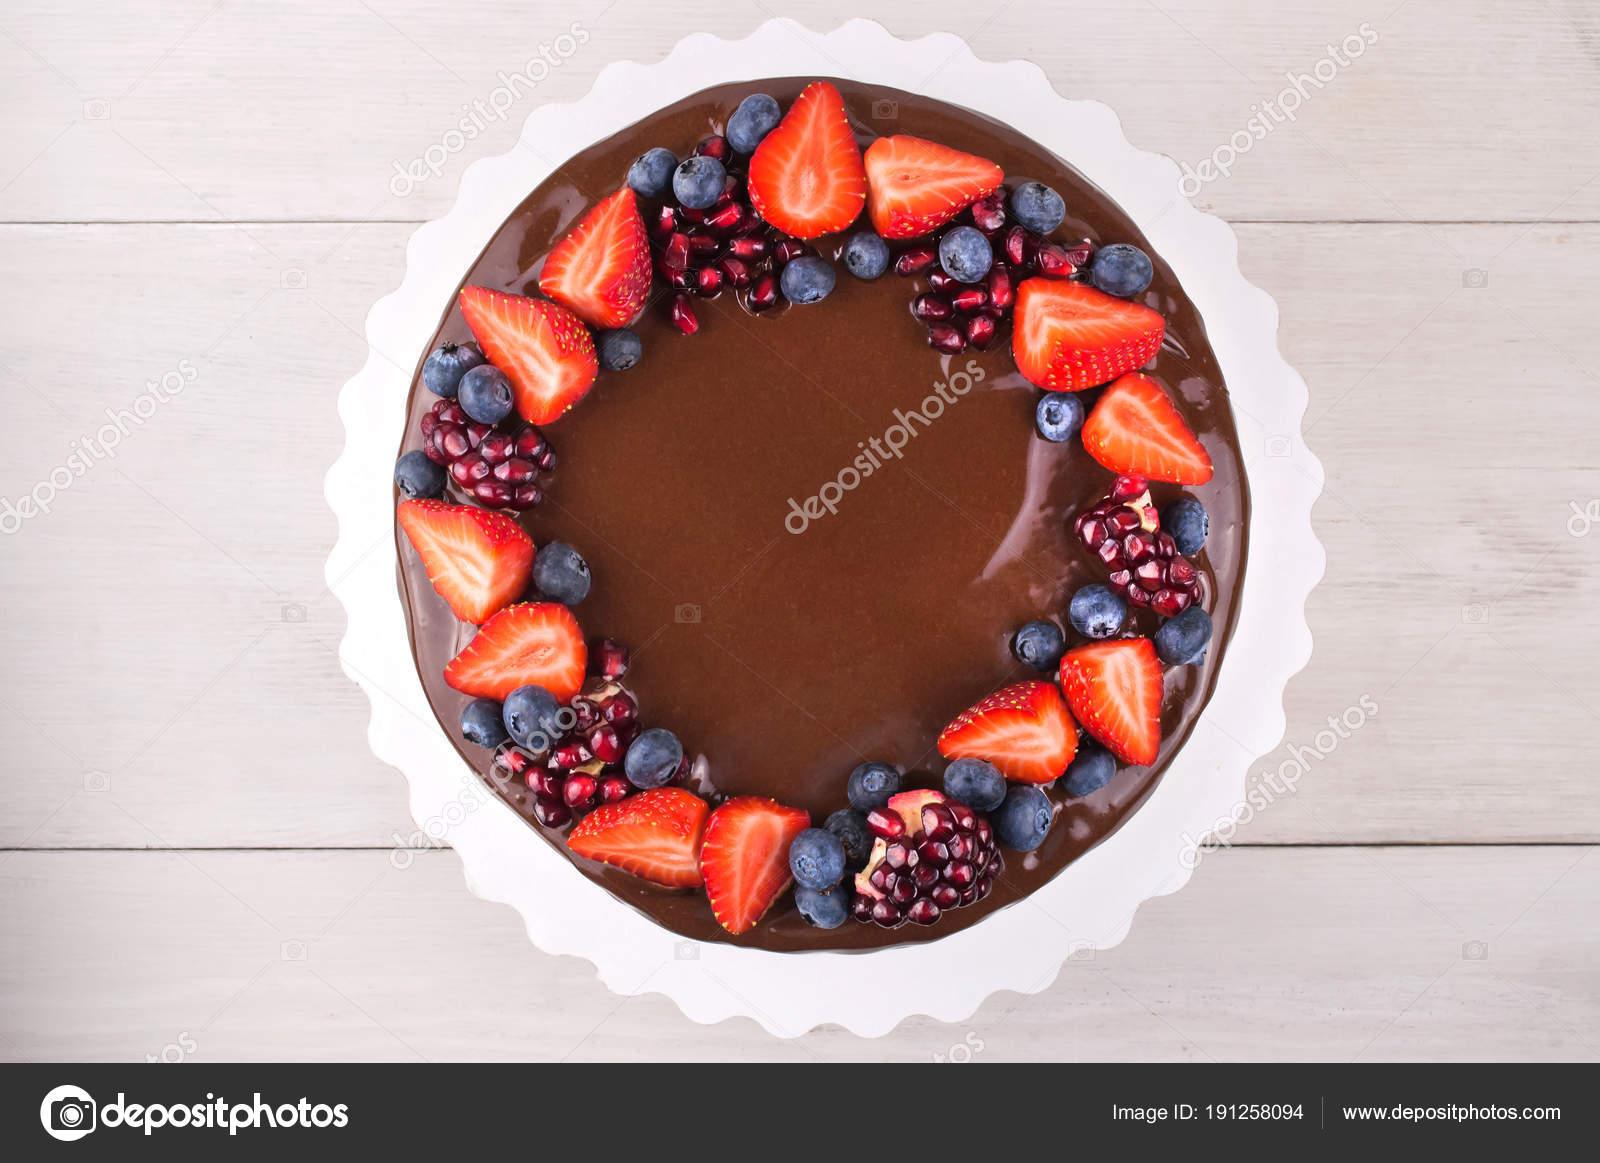 Birthday Cake Chocolate Strawberries Blueberries Garnet White Wooden Table Top Stock Photo